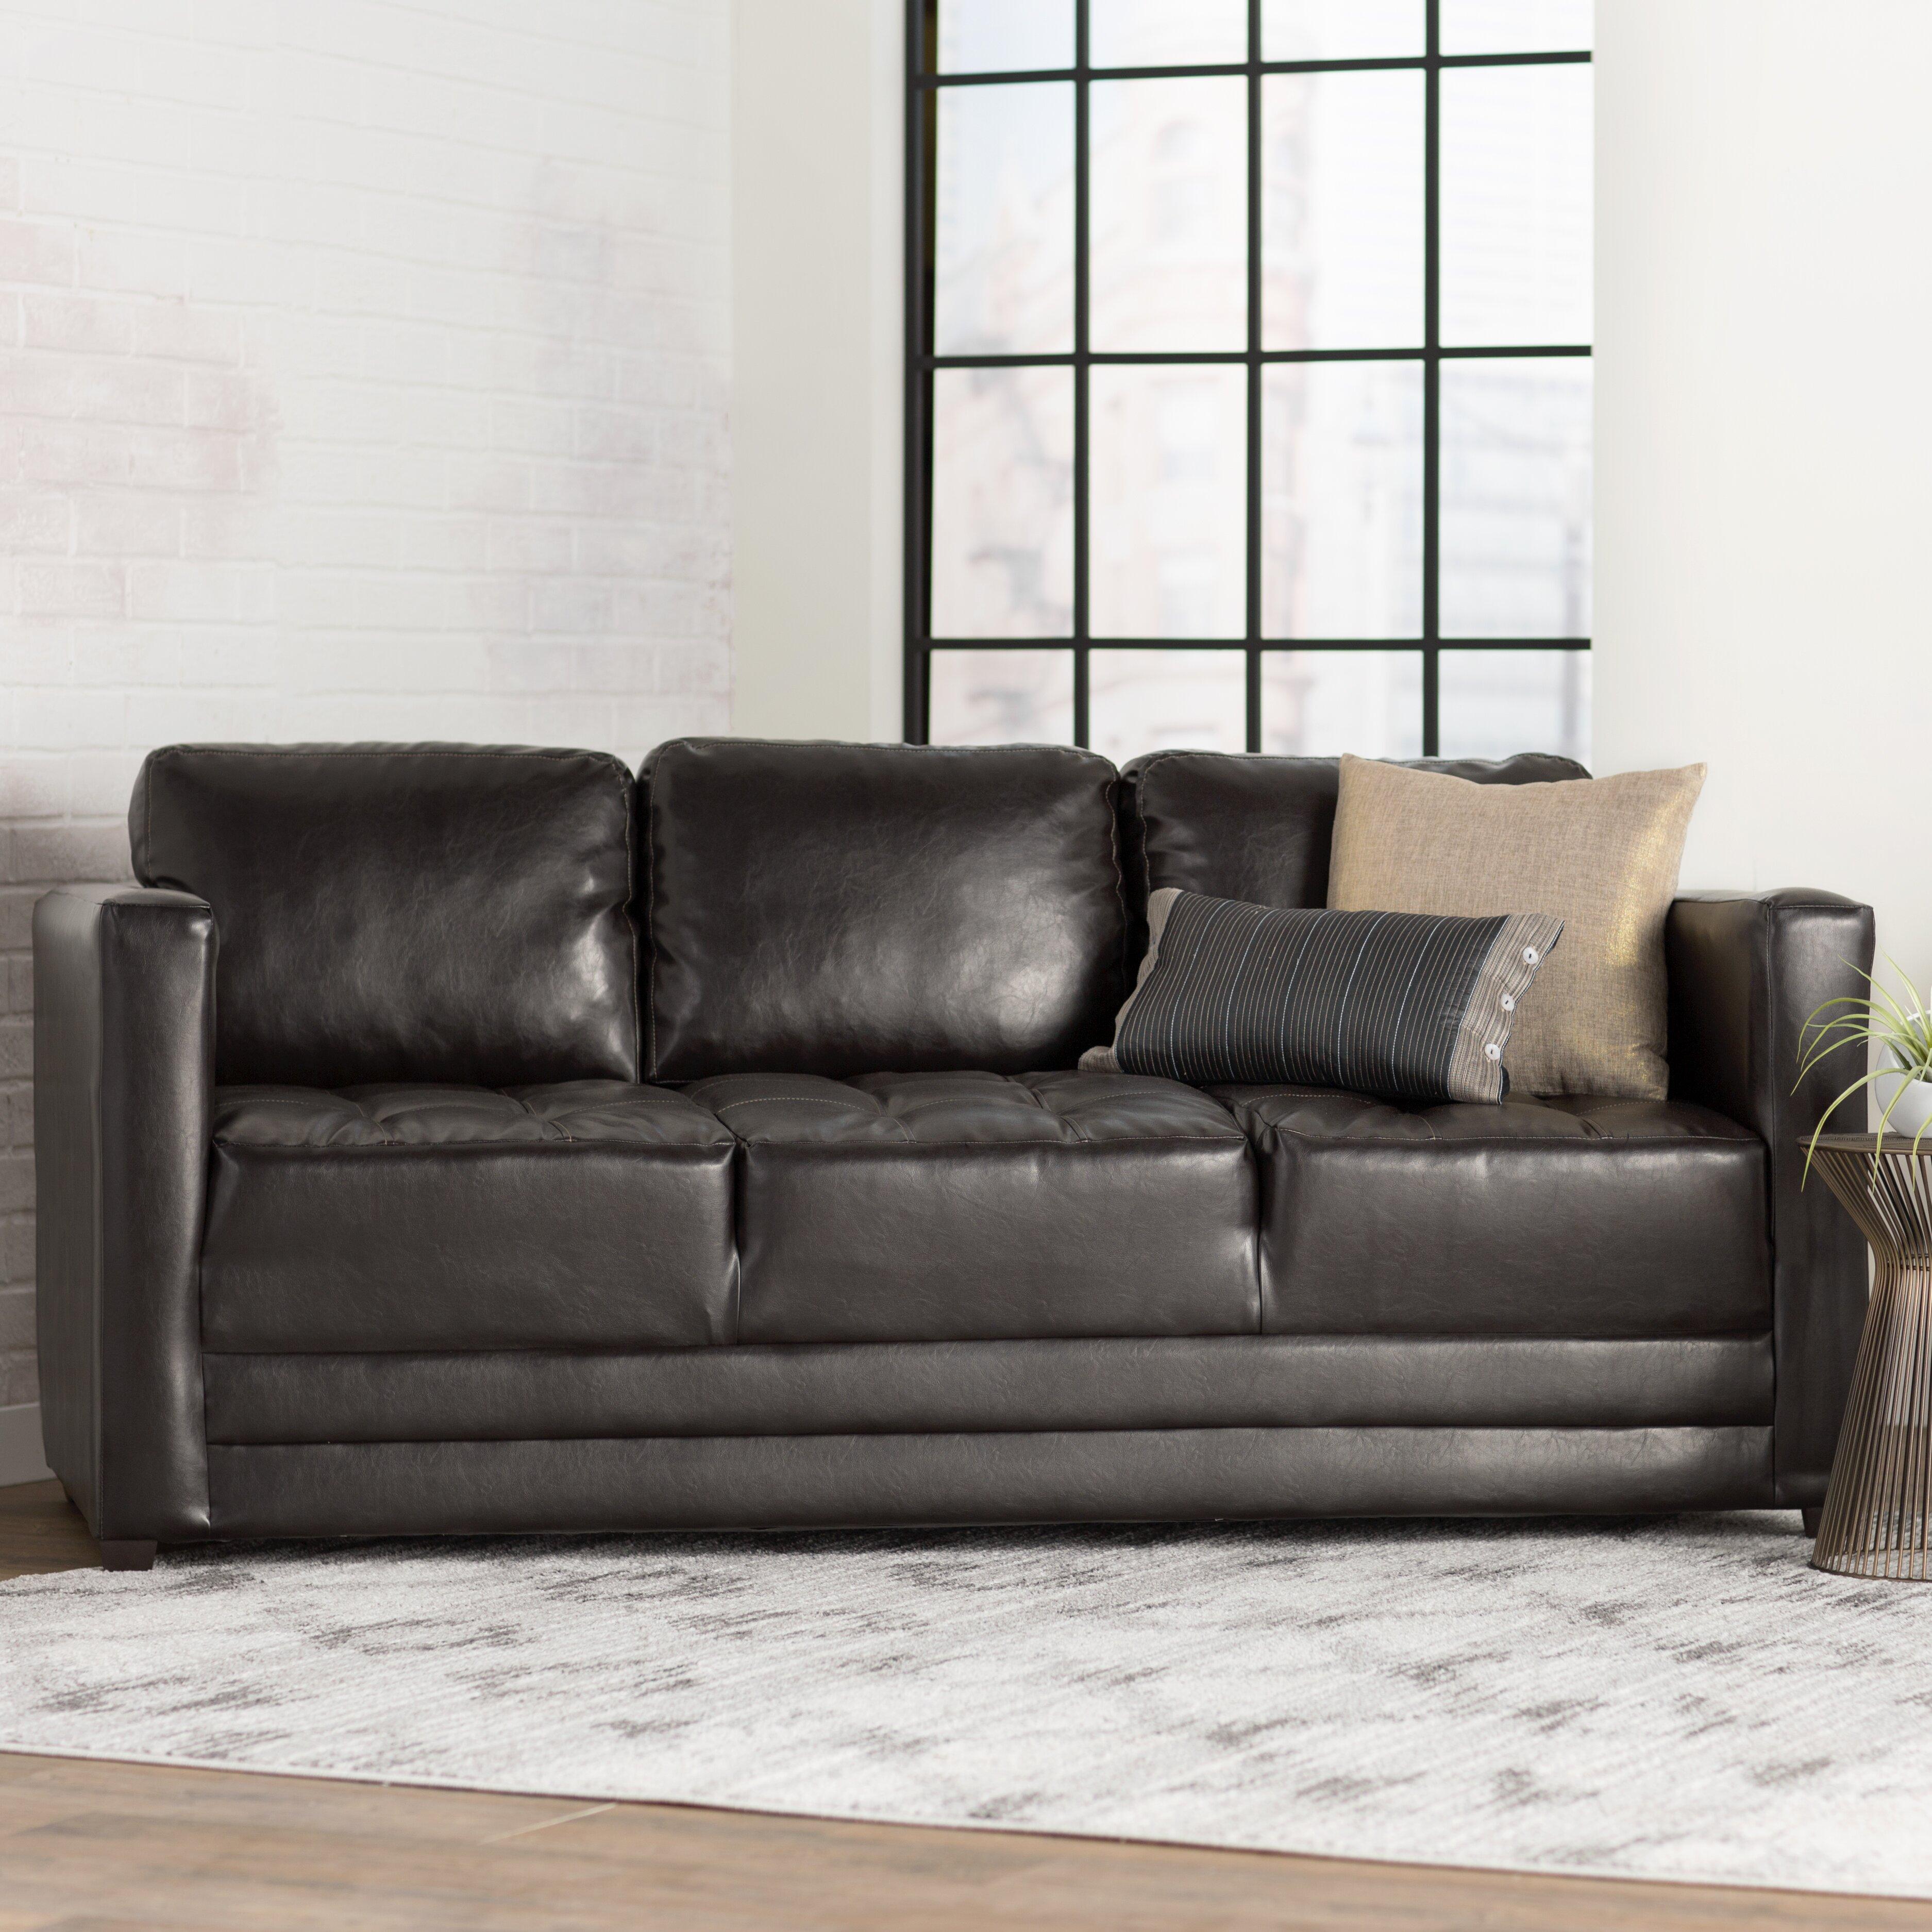 Trent Austin Design Serta Upholstery Winchendon Sofa TADN TADN